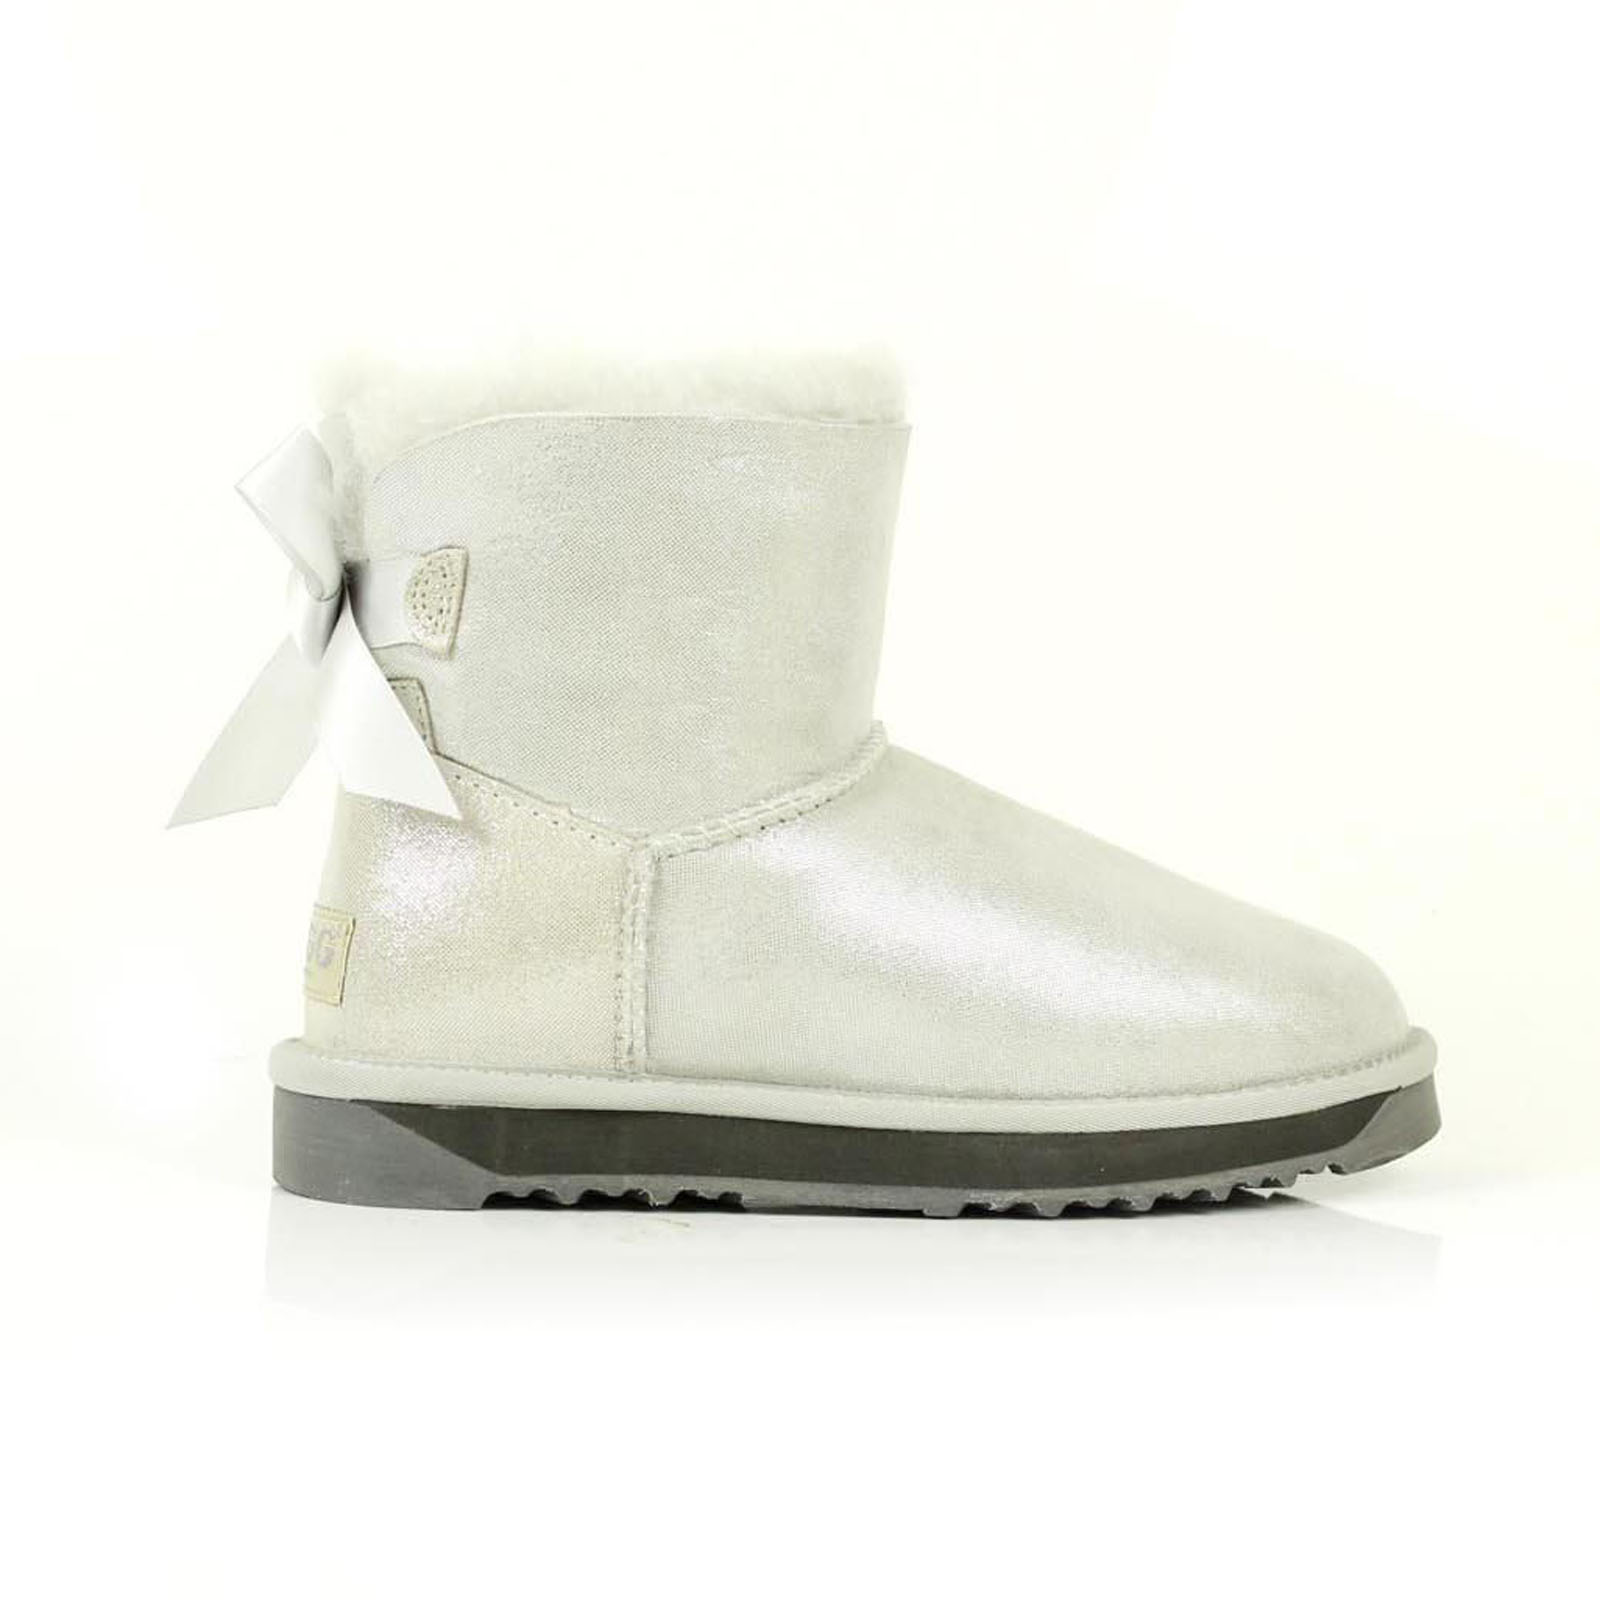 Ugg-Boots-Sheepskin-100-Wool-Ladies-Mini-Short-